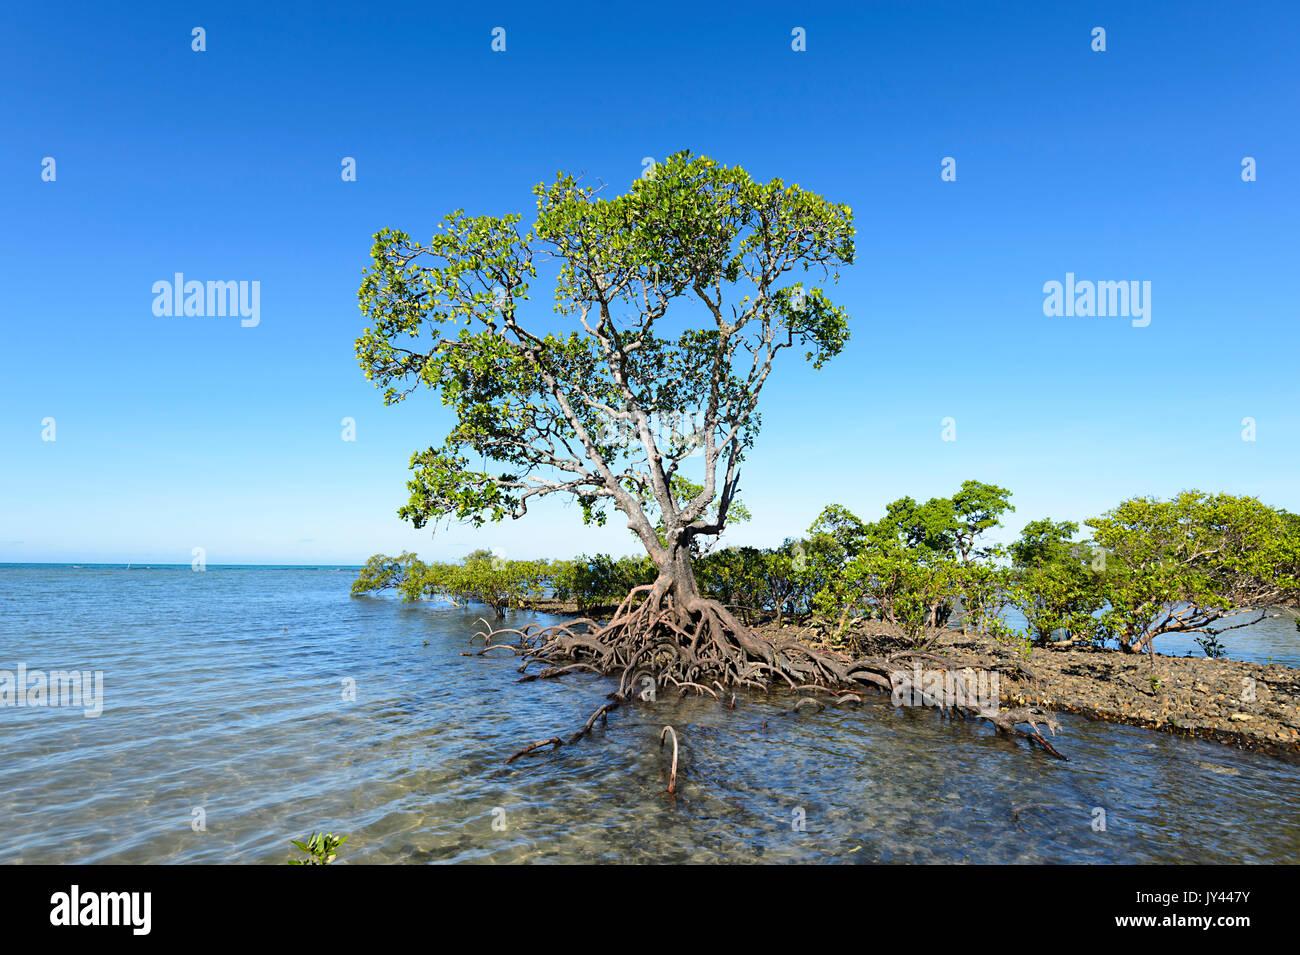 Single Mangrove tree, Myall Beach, Cape Tribulation, Daintree National Park, Far North Queensland, FNQ, QLD, Australia - Stock Image